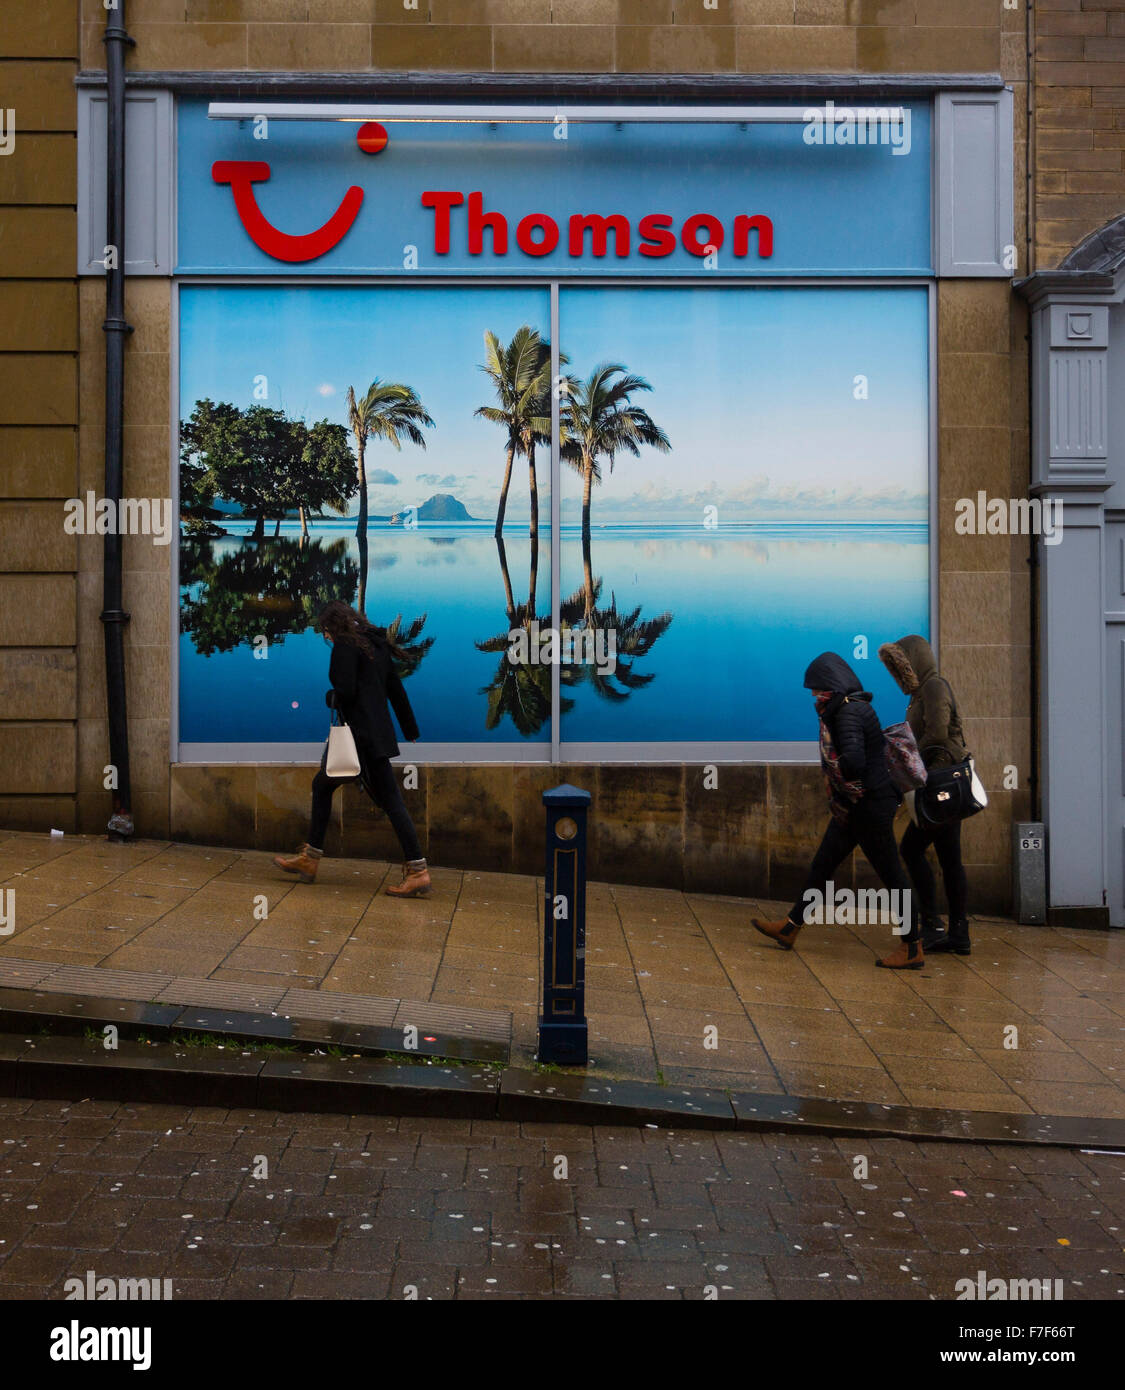 Thompson Travel Uk: Huddersfield, UK. 30th Nov, 2015. People Walking Past A